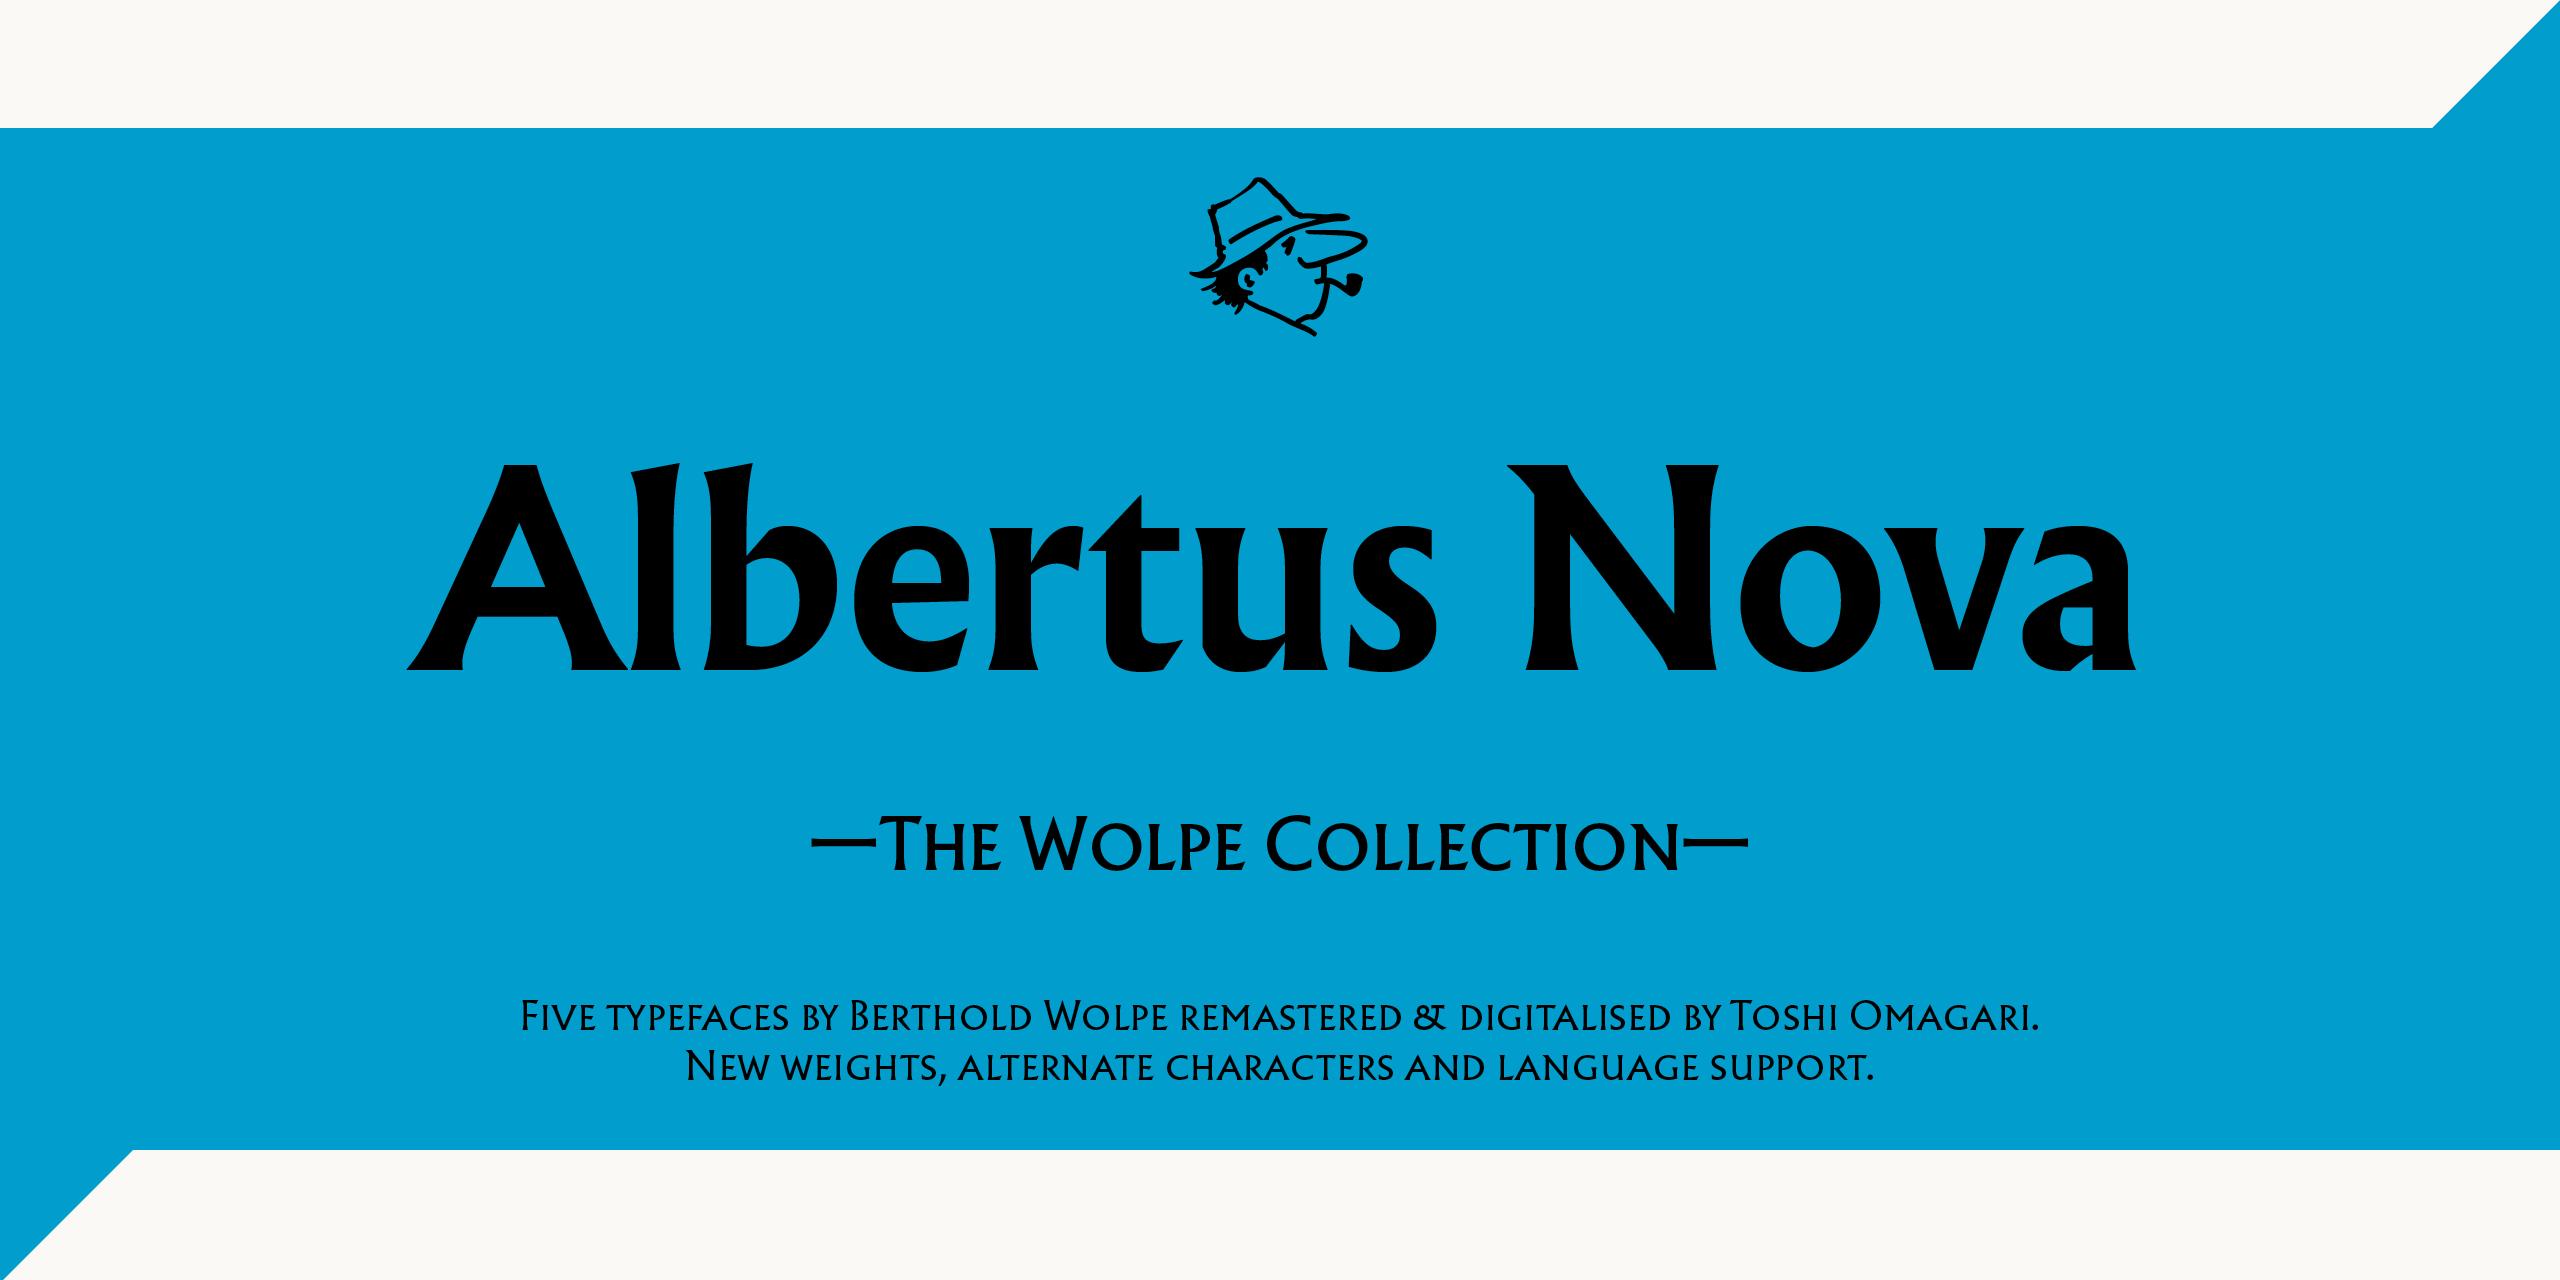 The Wolpe Collection – Albertus Nova